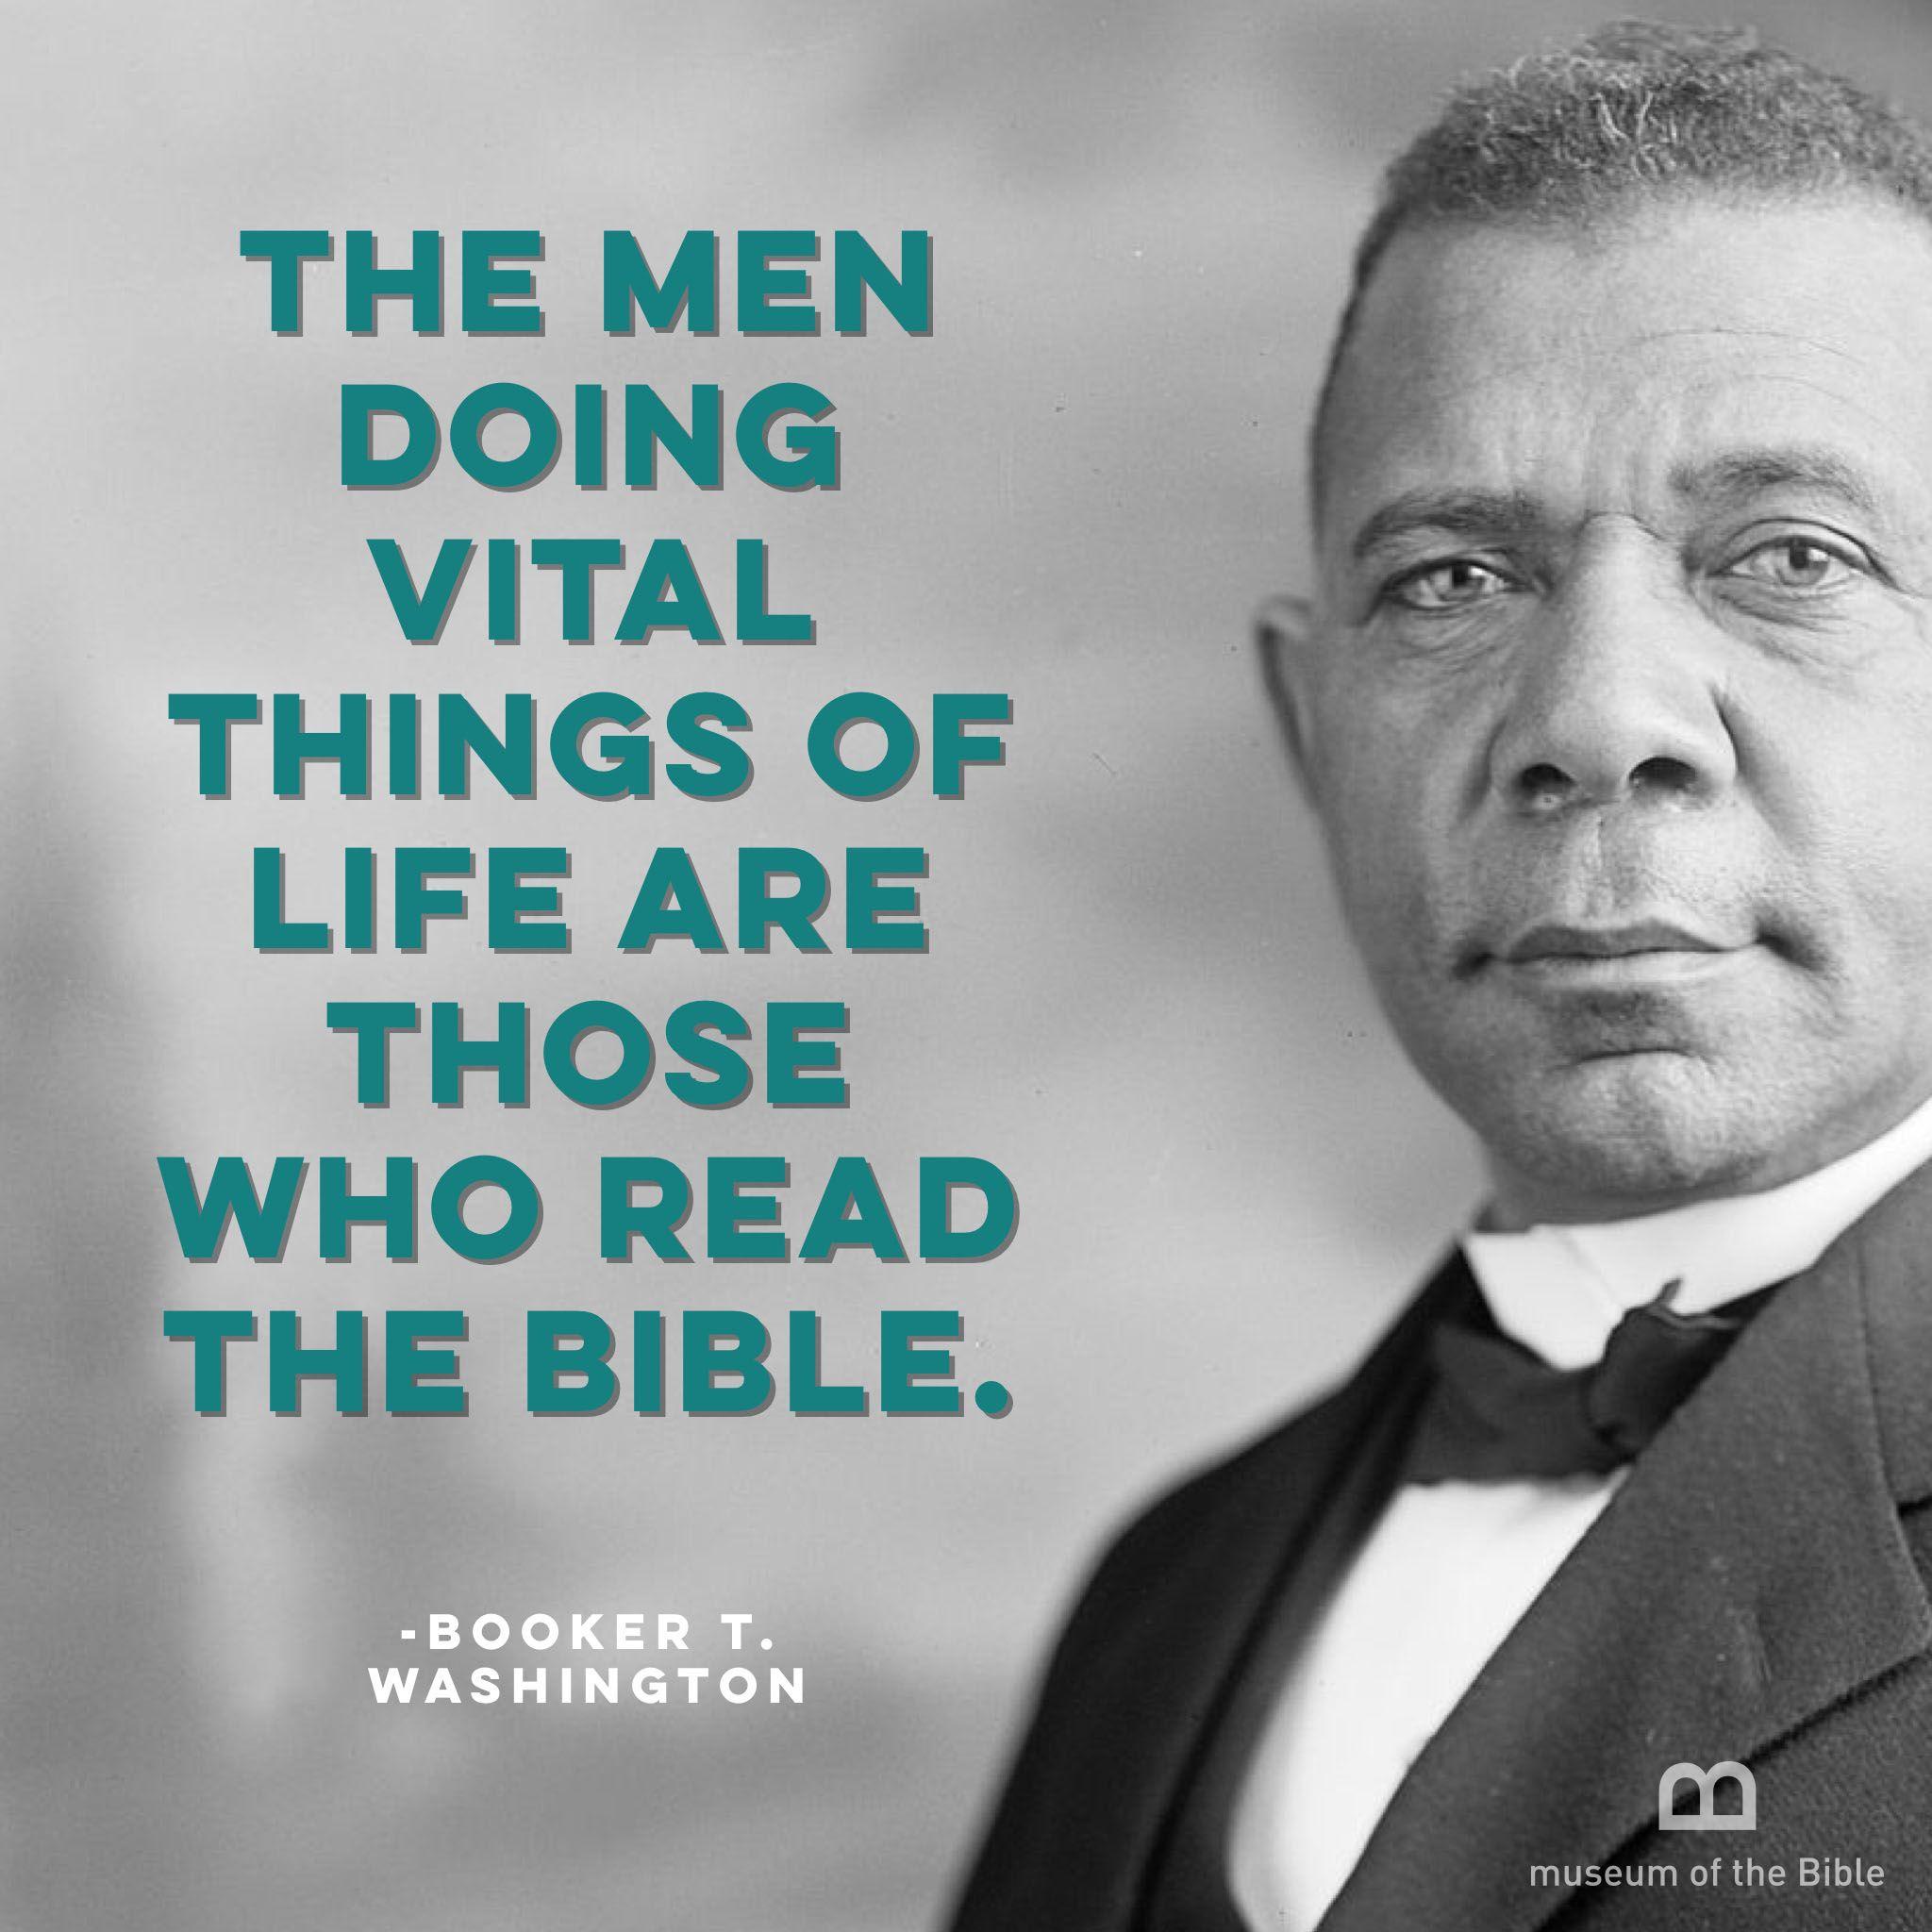 Booker T Washington Quotes Booker Twashington On The Bible Bible Impact Quotes  Pinterest .